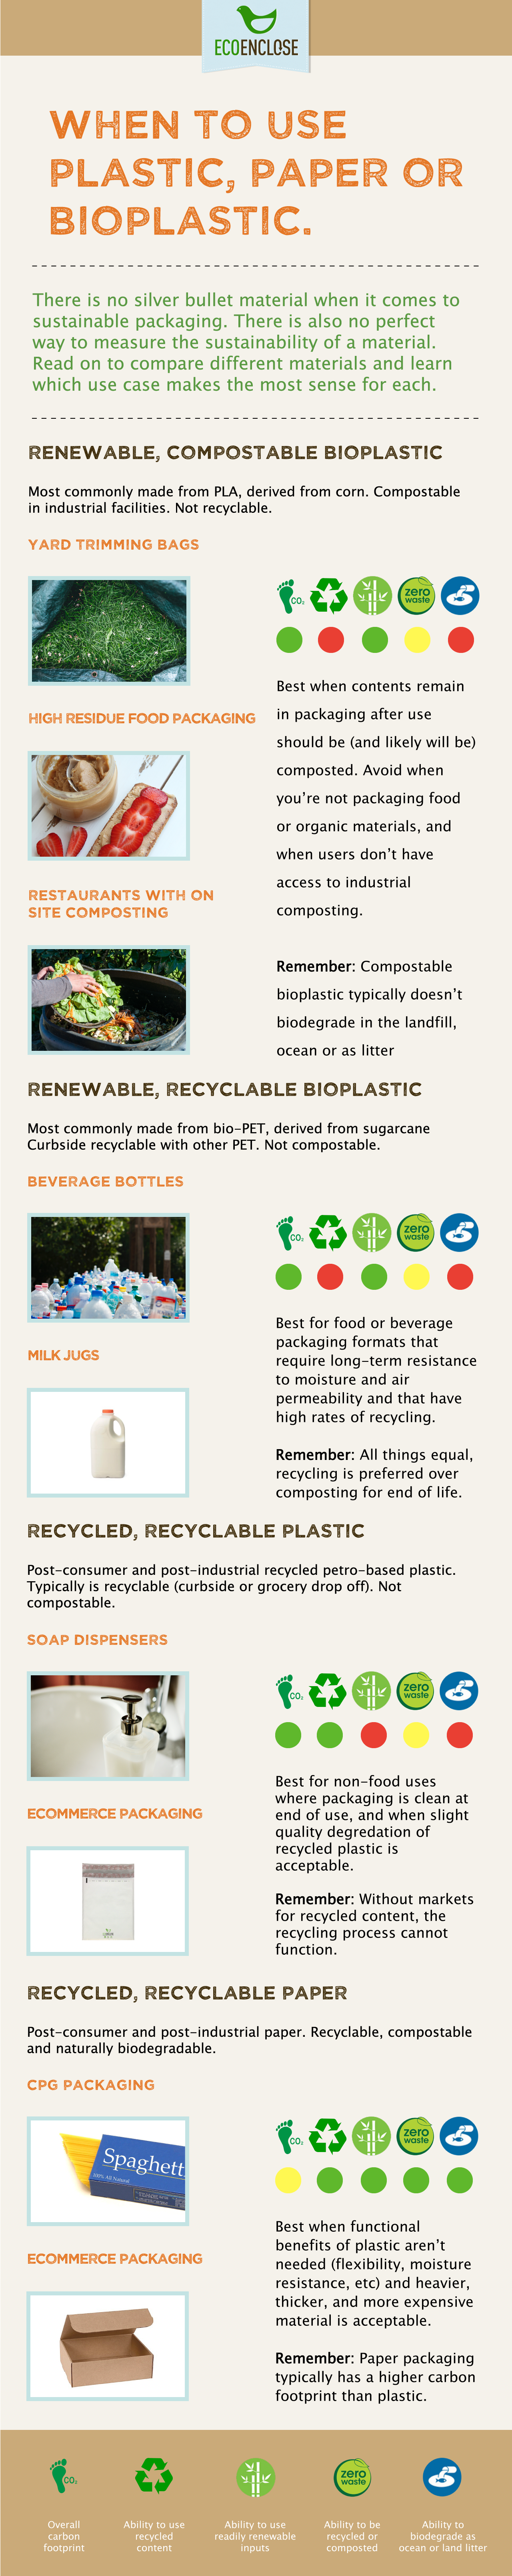 Bioplastics: The Good, bad and ugly